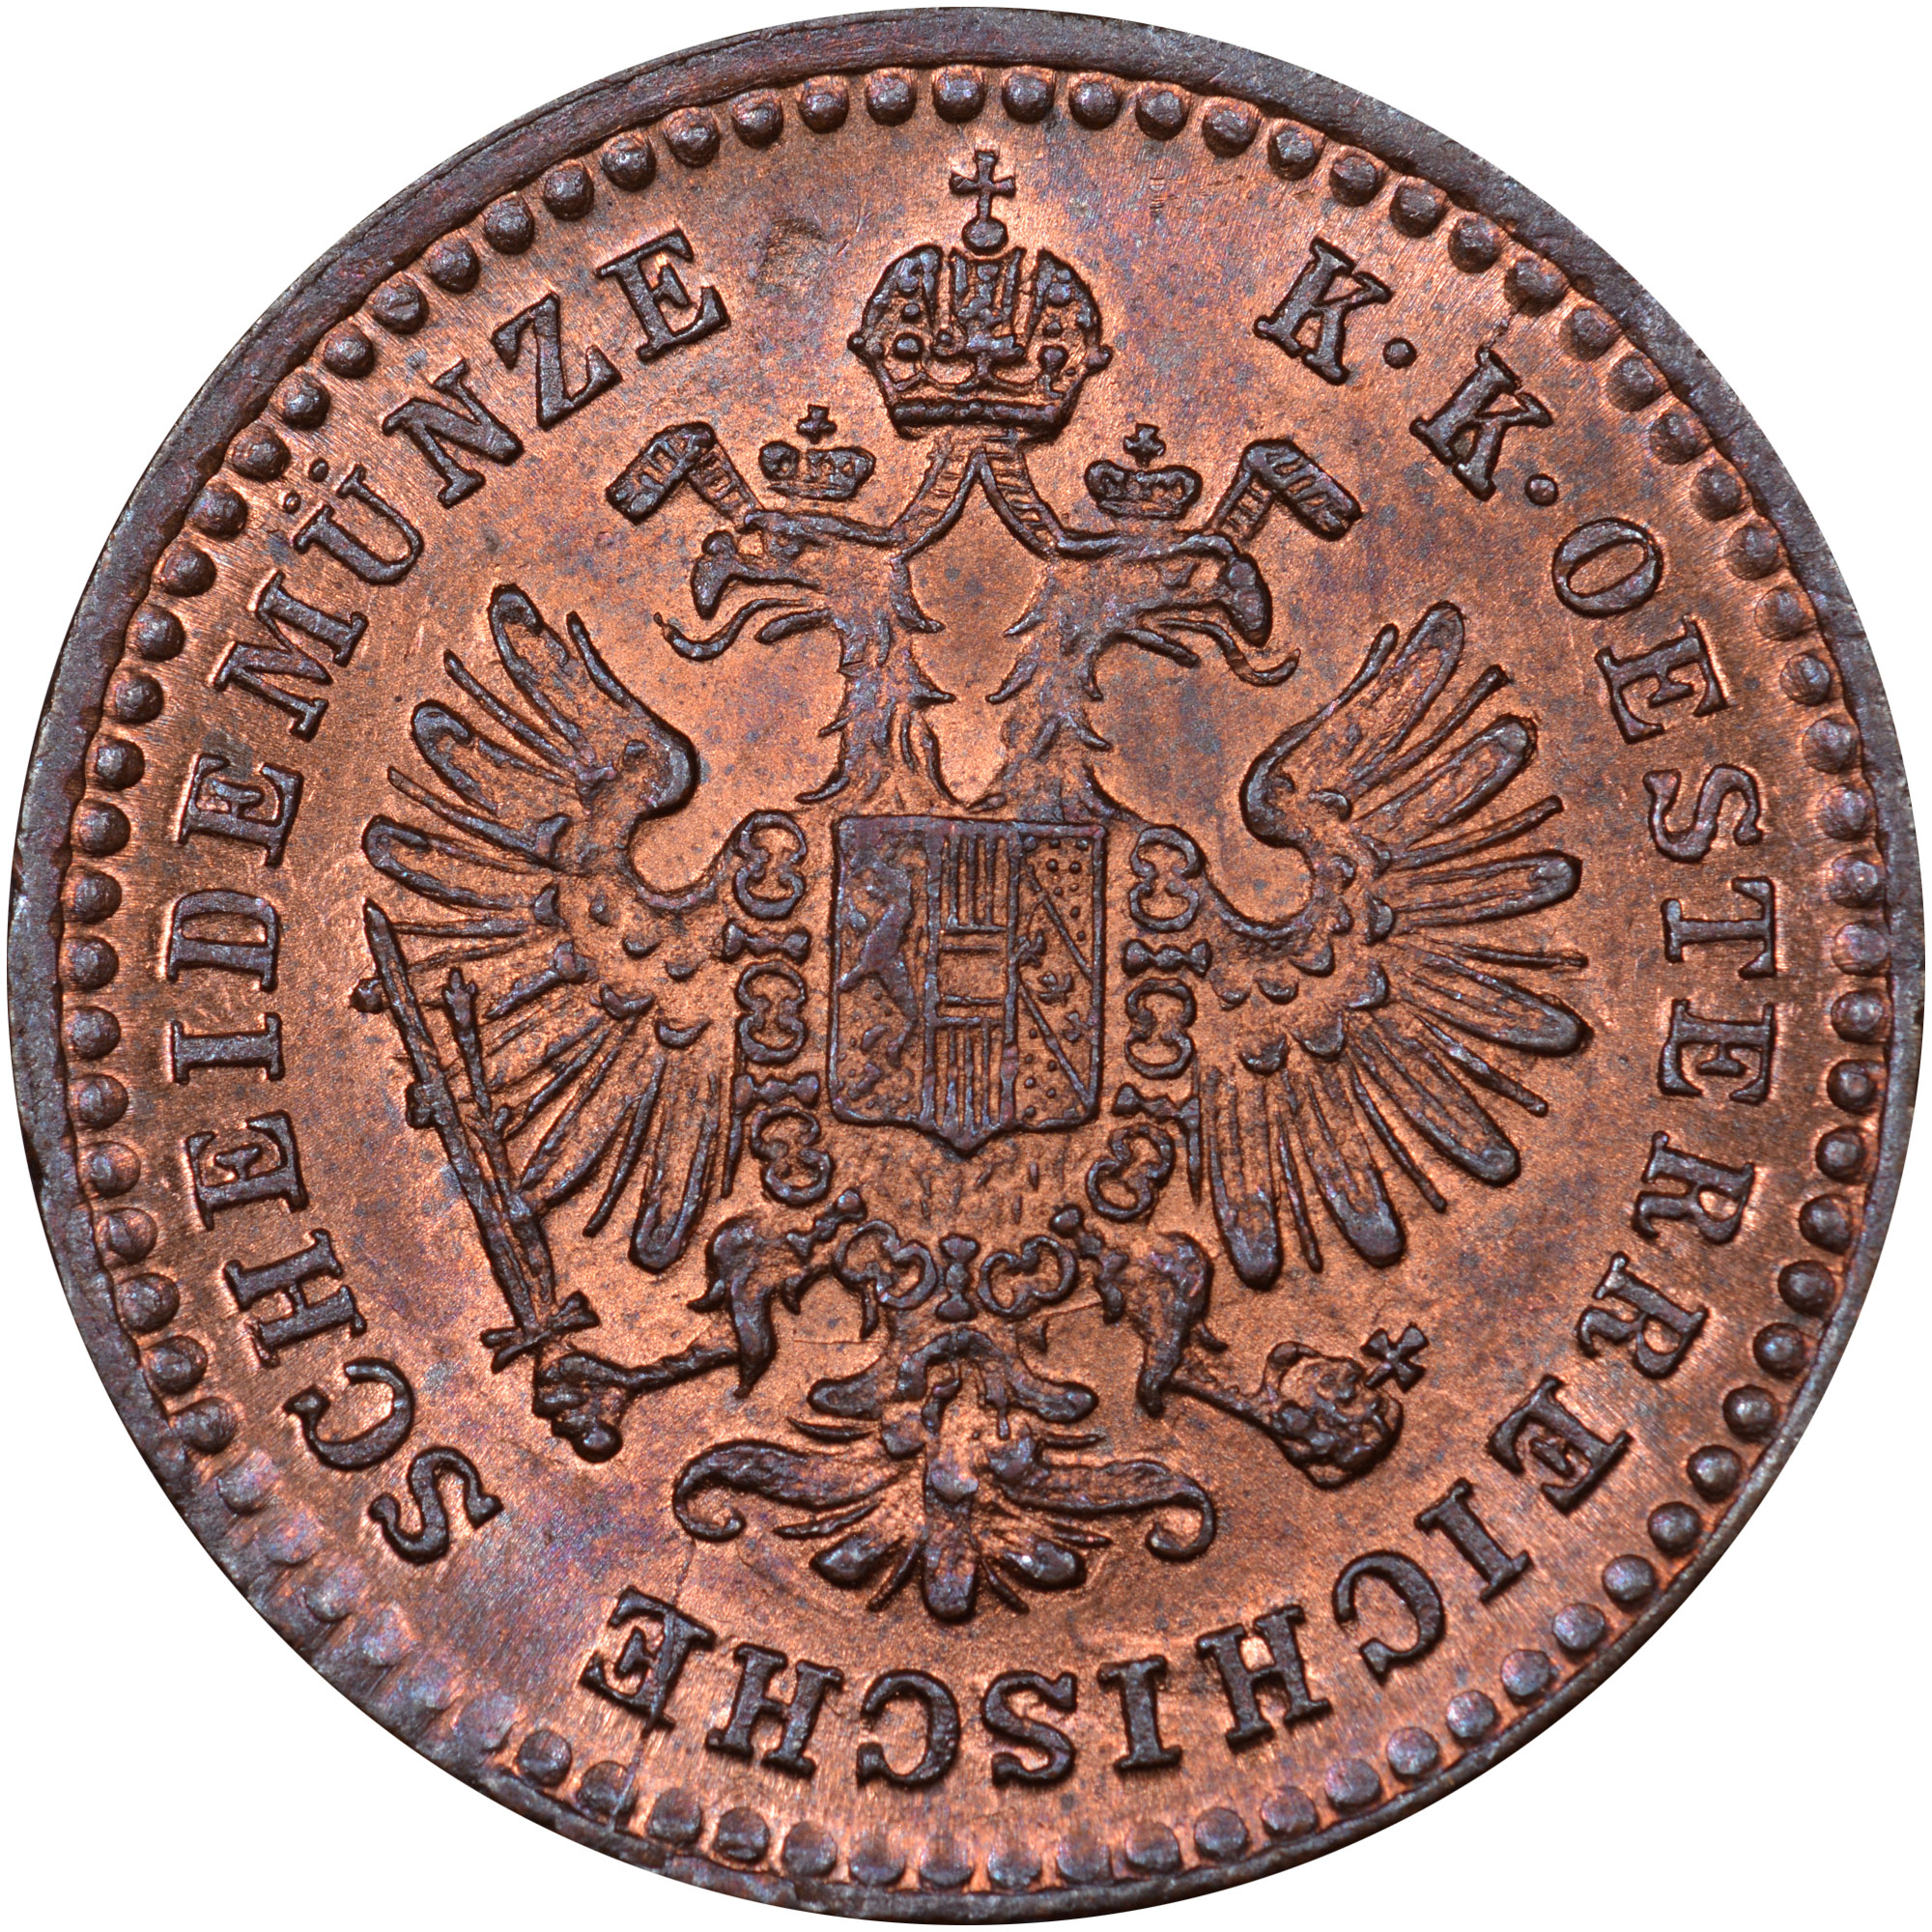 1858-1866 Austria 5/10 Kreuzer obverse